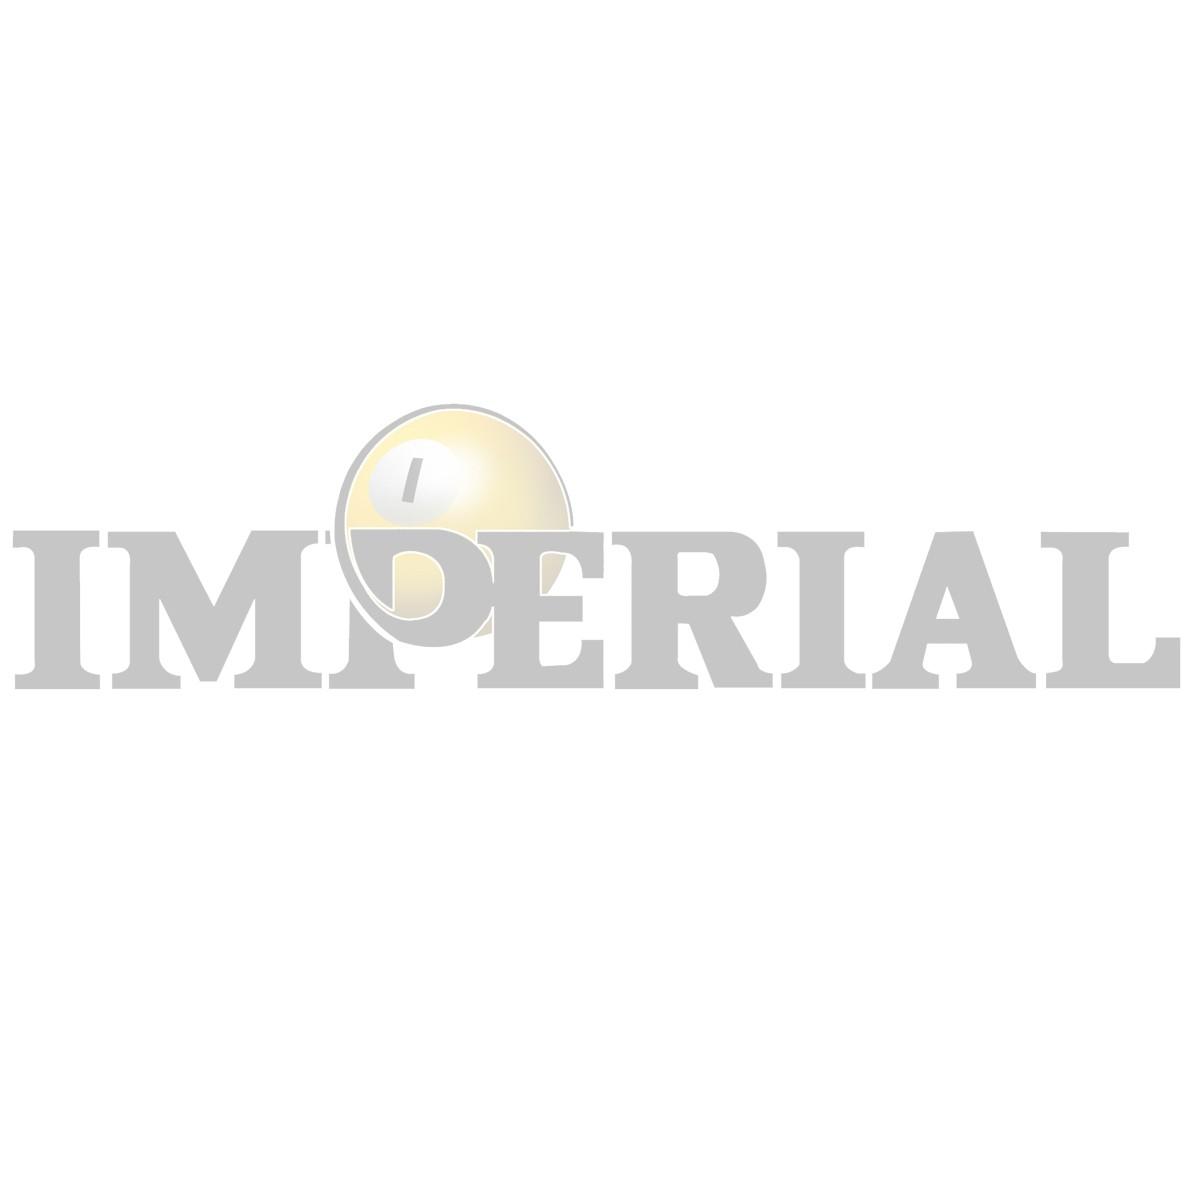 Indianapolis Colts Home vs. Away Billiard Ball Set